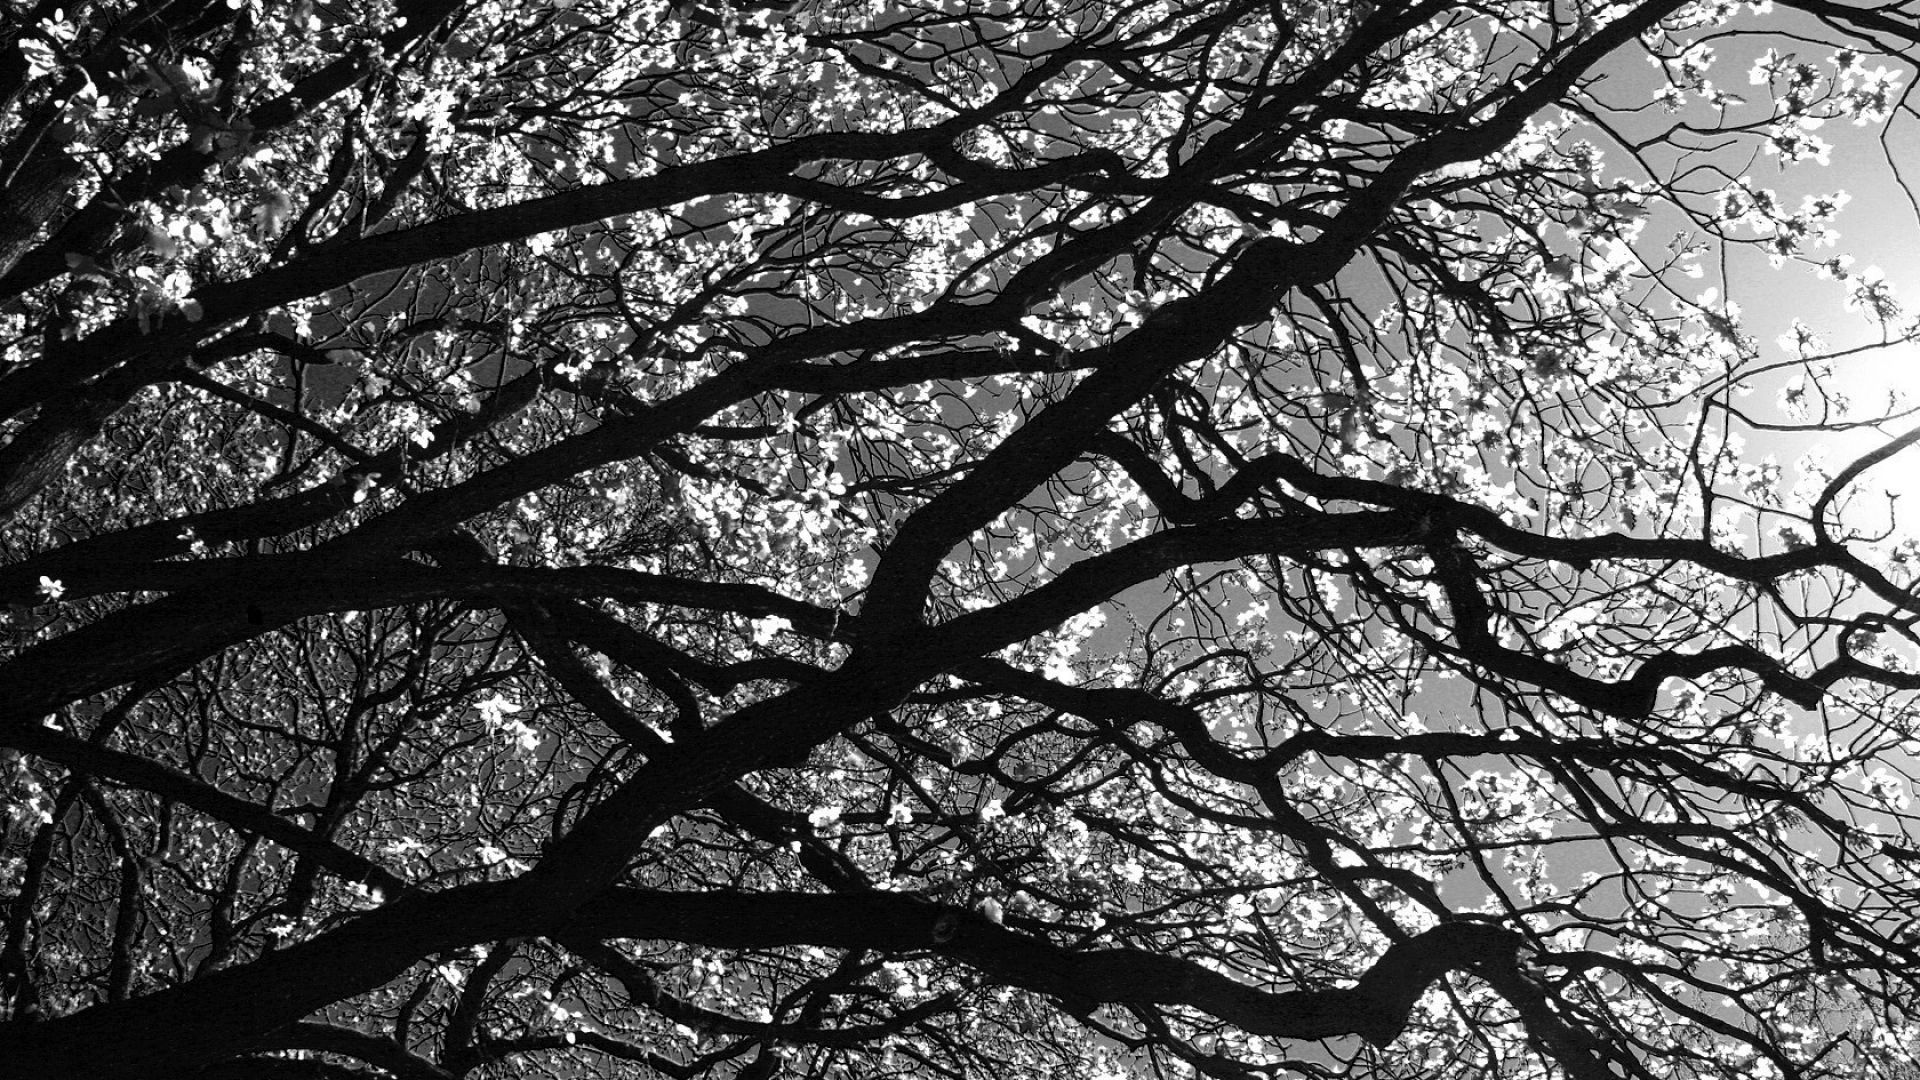 Tree Branch HD Wallpaper